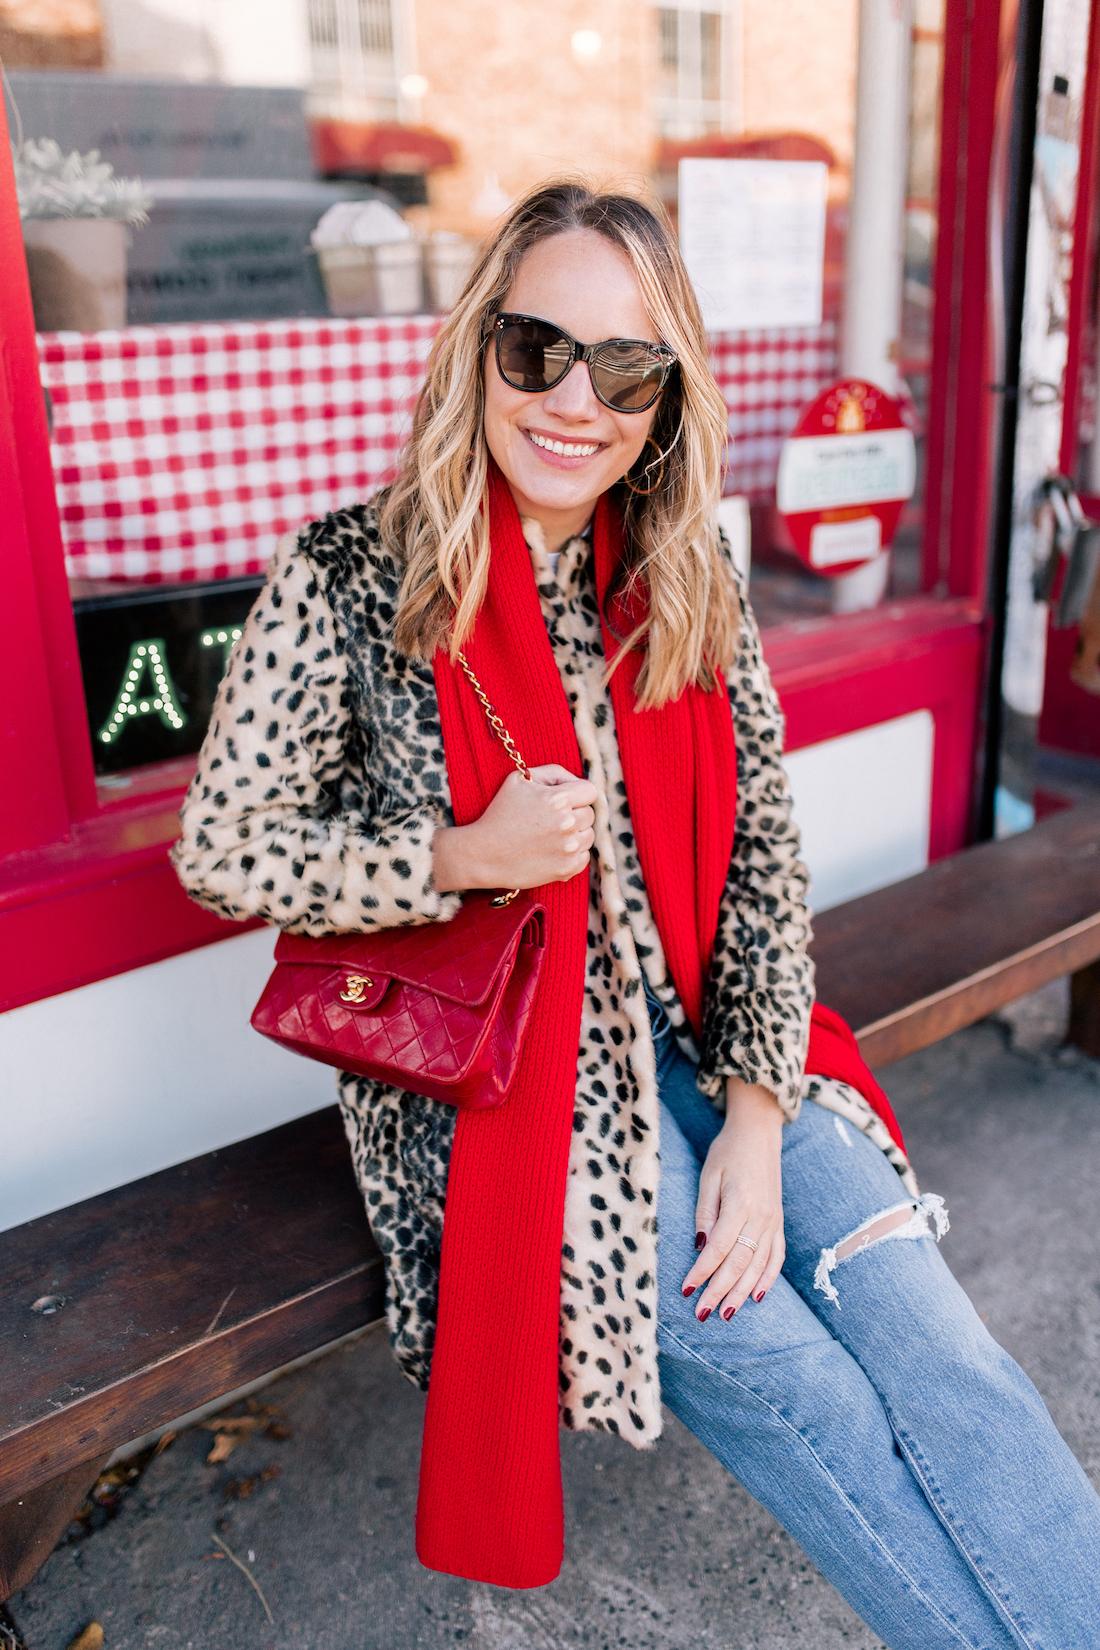 J. McLaughlin Leopard Coat  // Aether Scarf // x Karla Tee // Levi's Jeans // Vintage Chanel Purse // Polaroid Sunglasses// BaubleBar Earrings